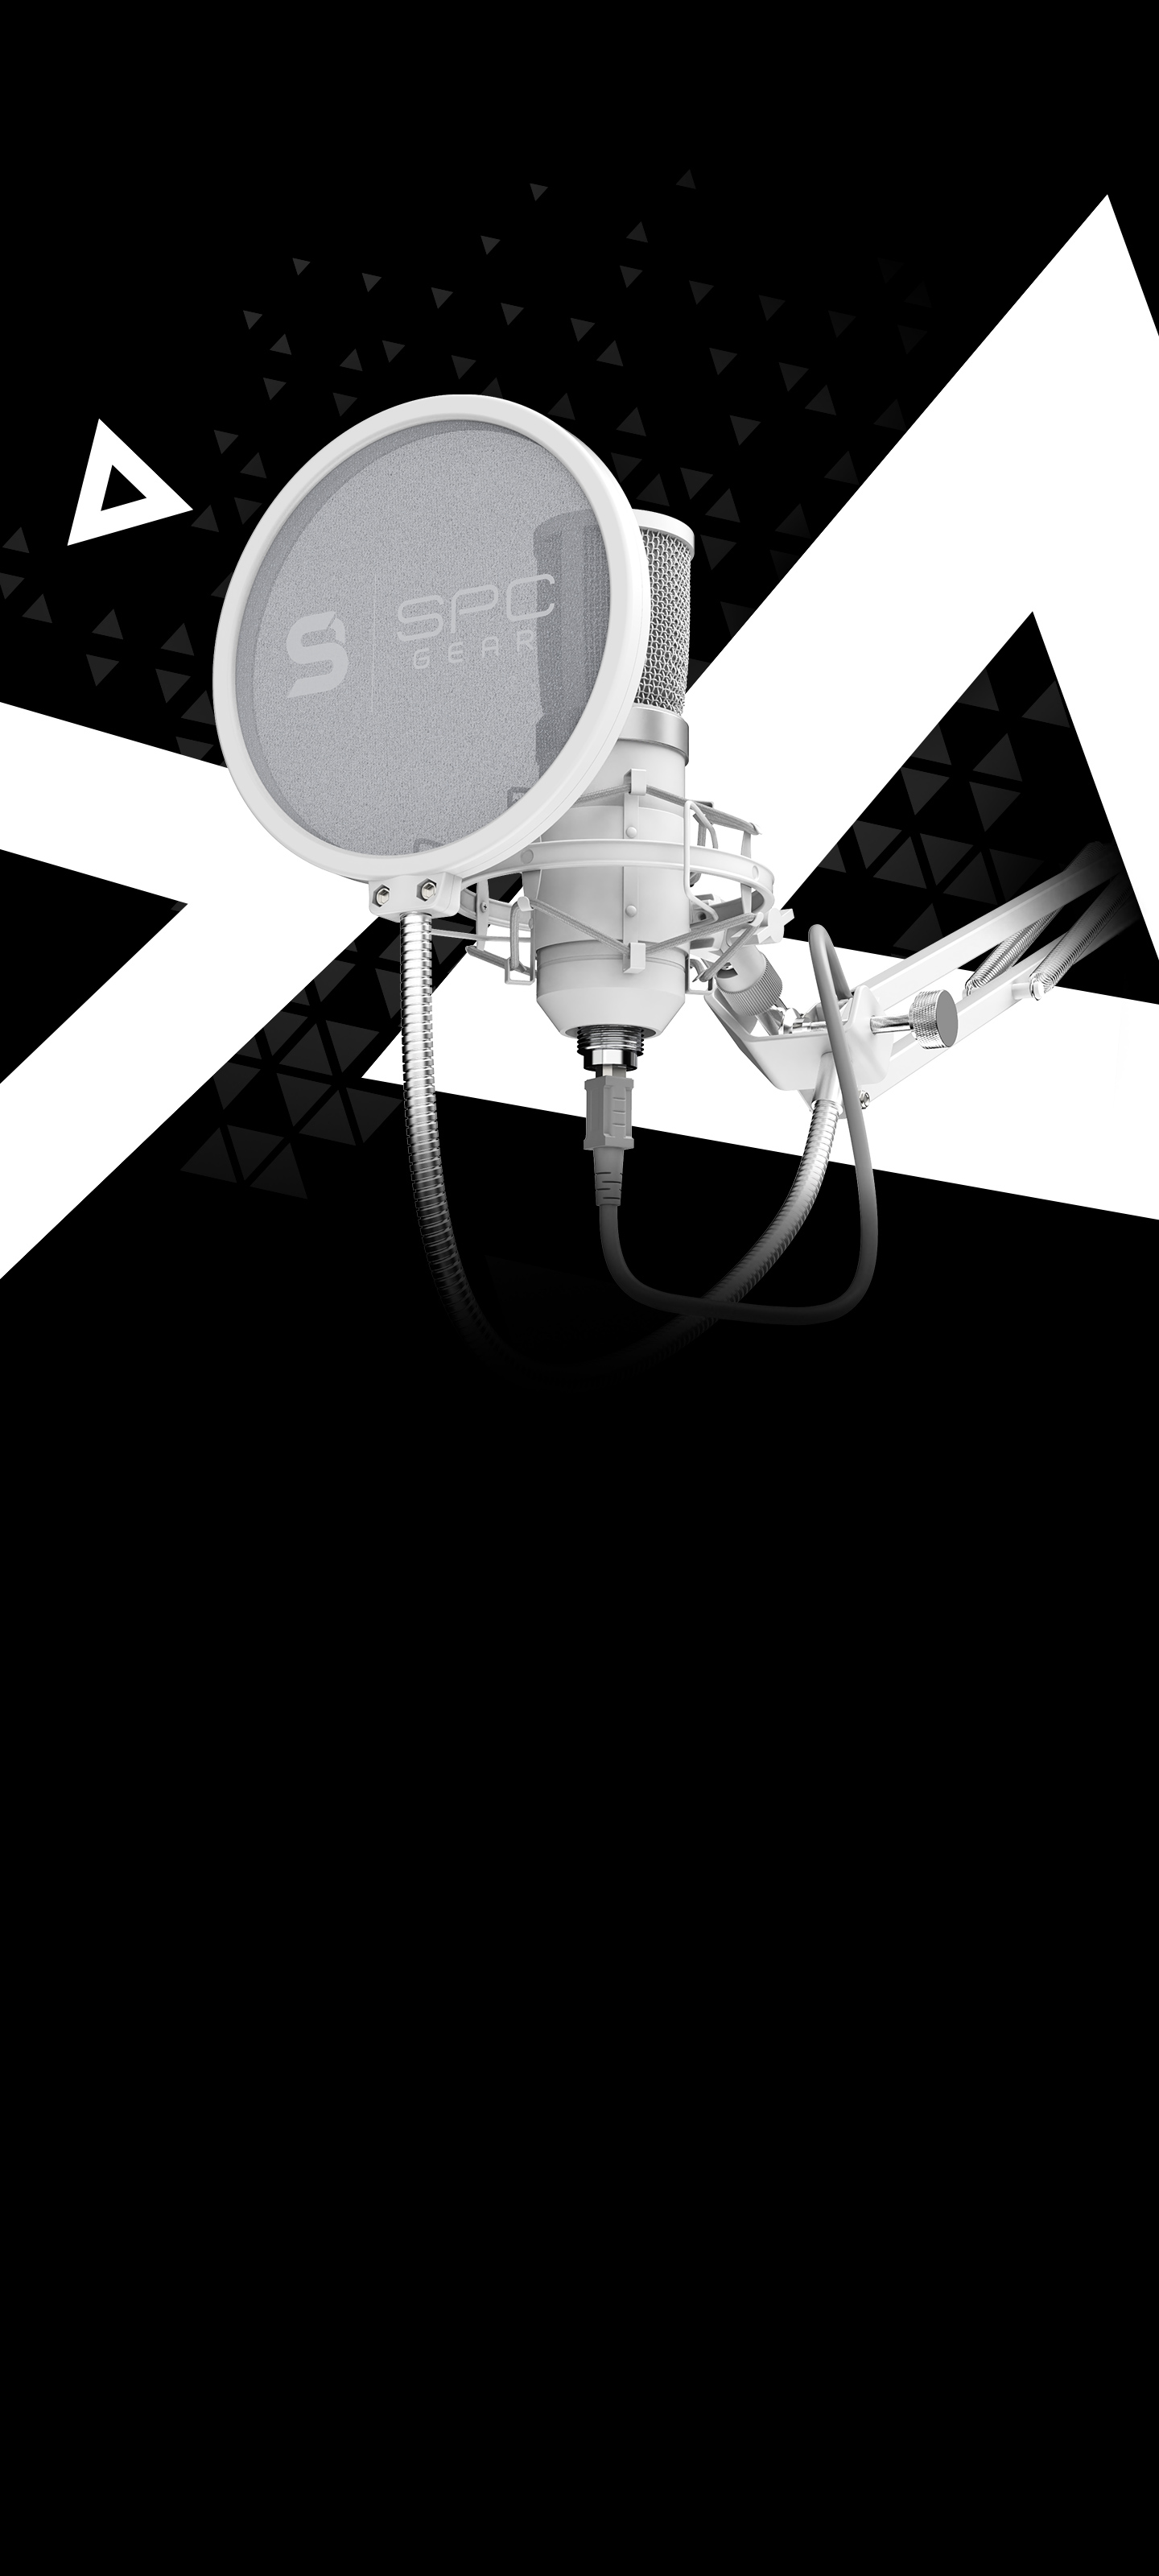 SPC Gear SM950 Onyx White Streaming USB Microphone